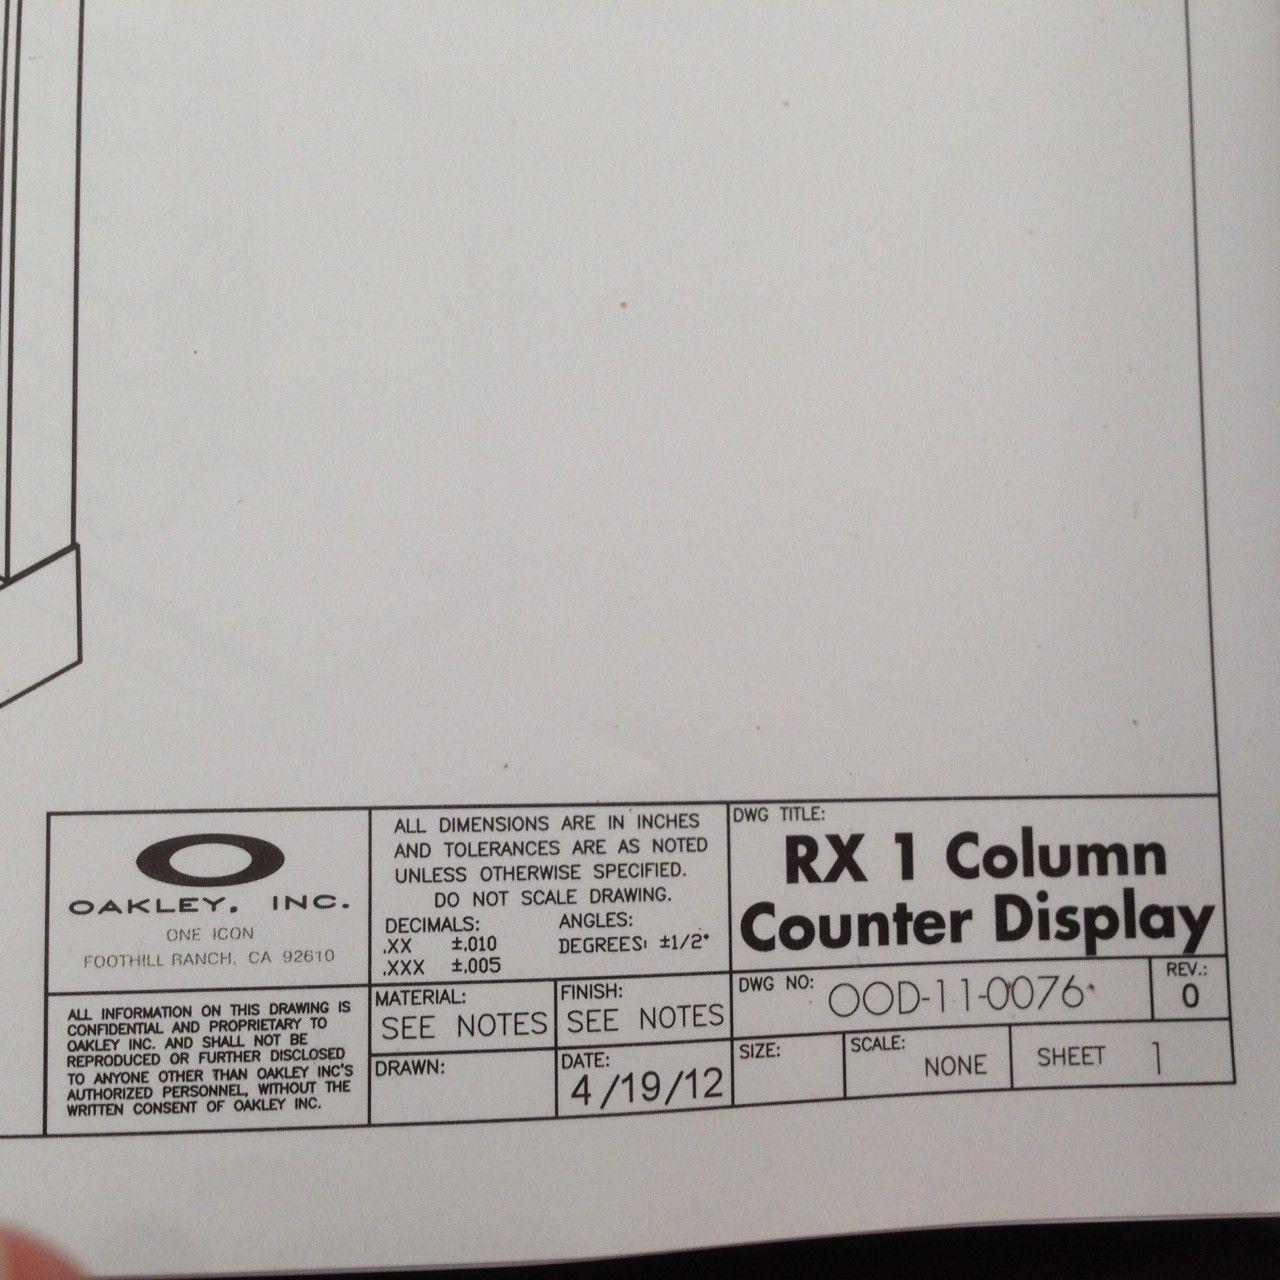 New in Box Oakley Counter Display - IMG_7806.JPG